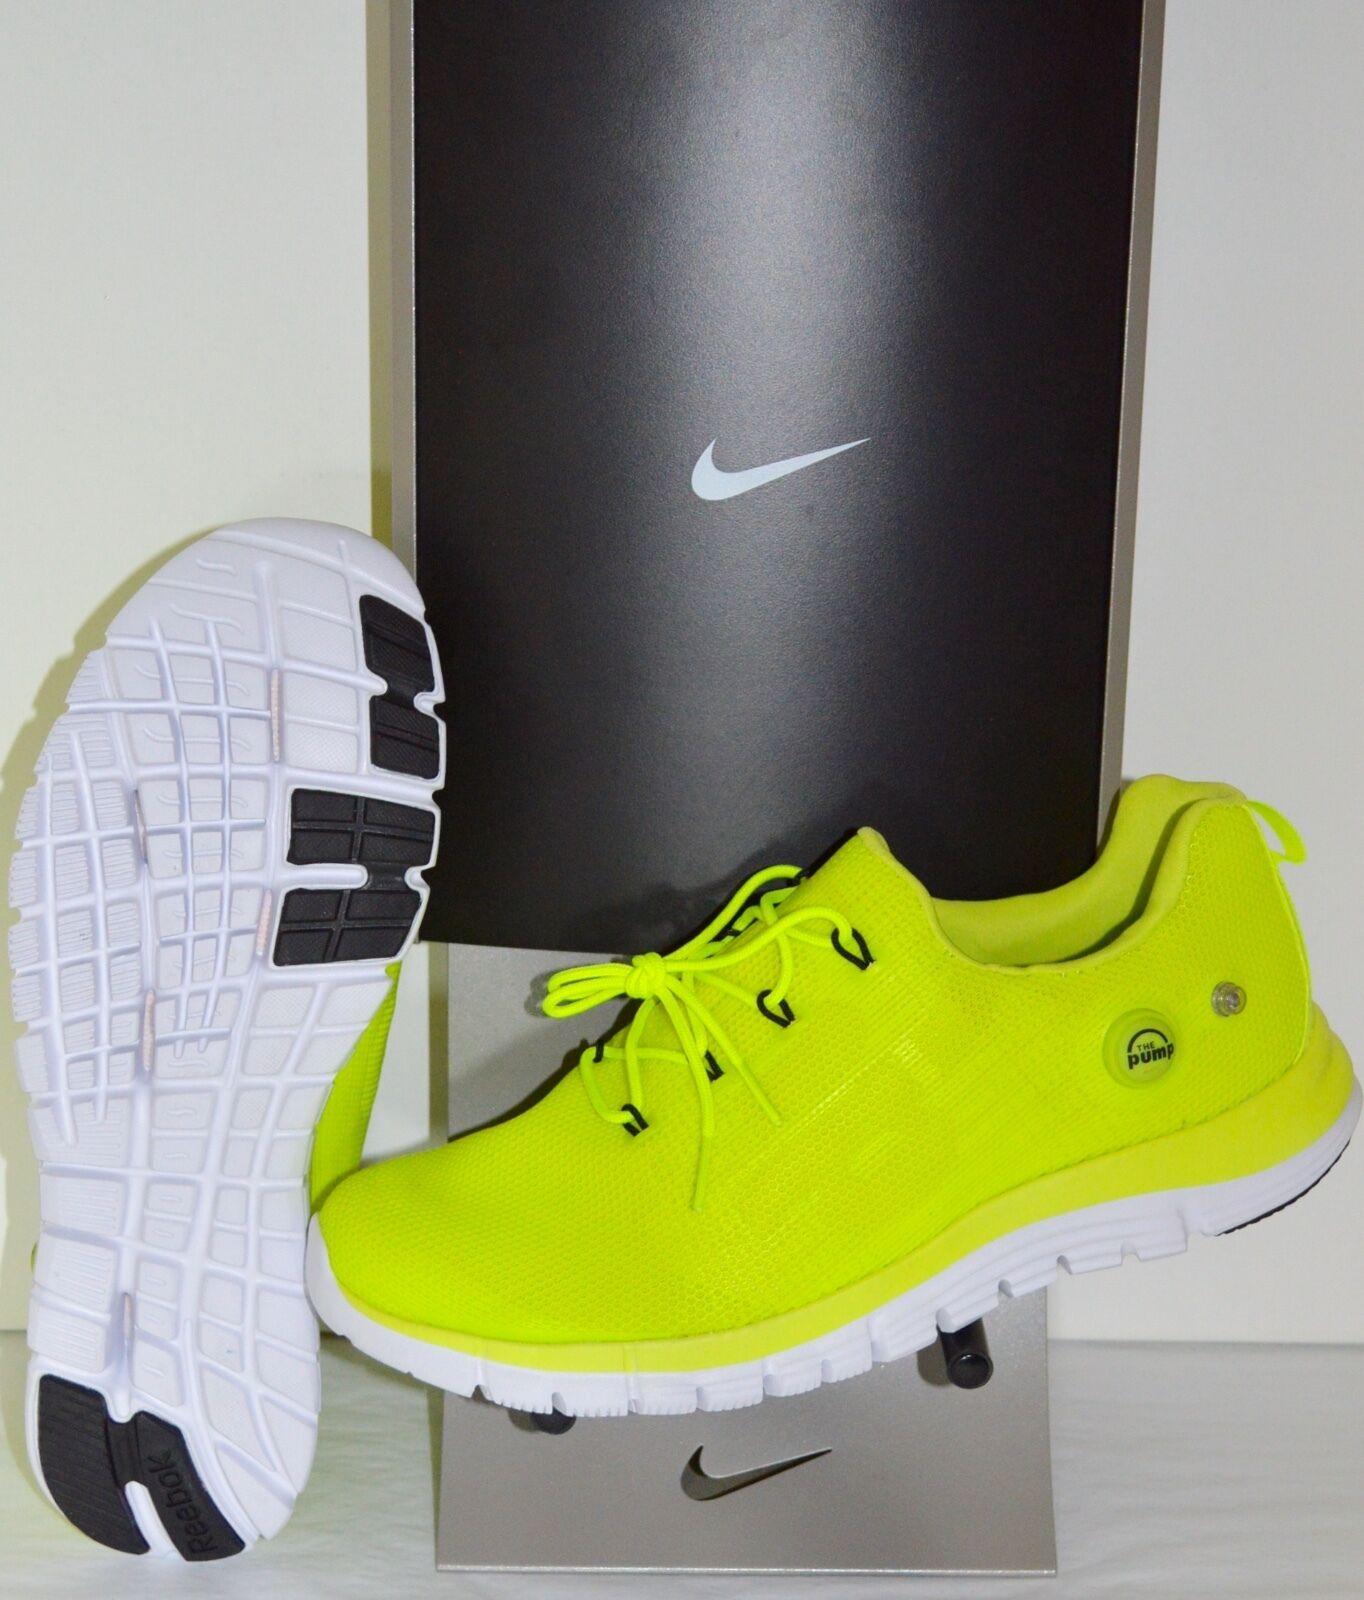 New Reebok ZPUMP PU Solar Yellow/Neon White Pump Shoes xpump Running